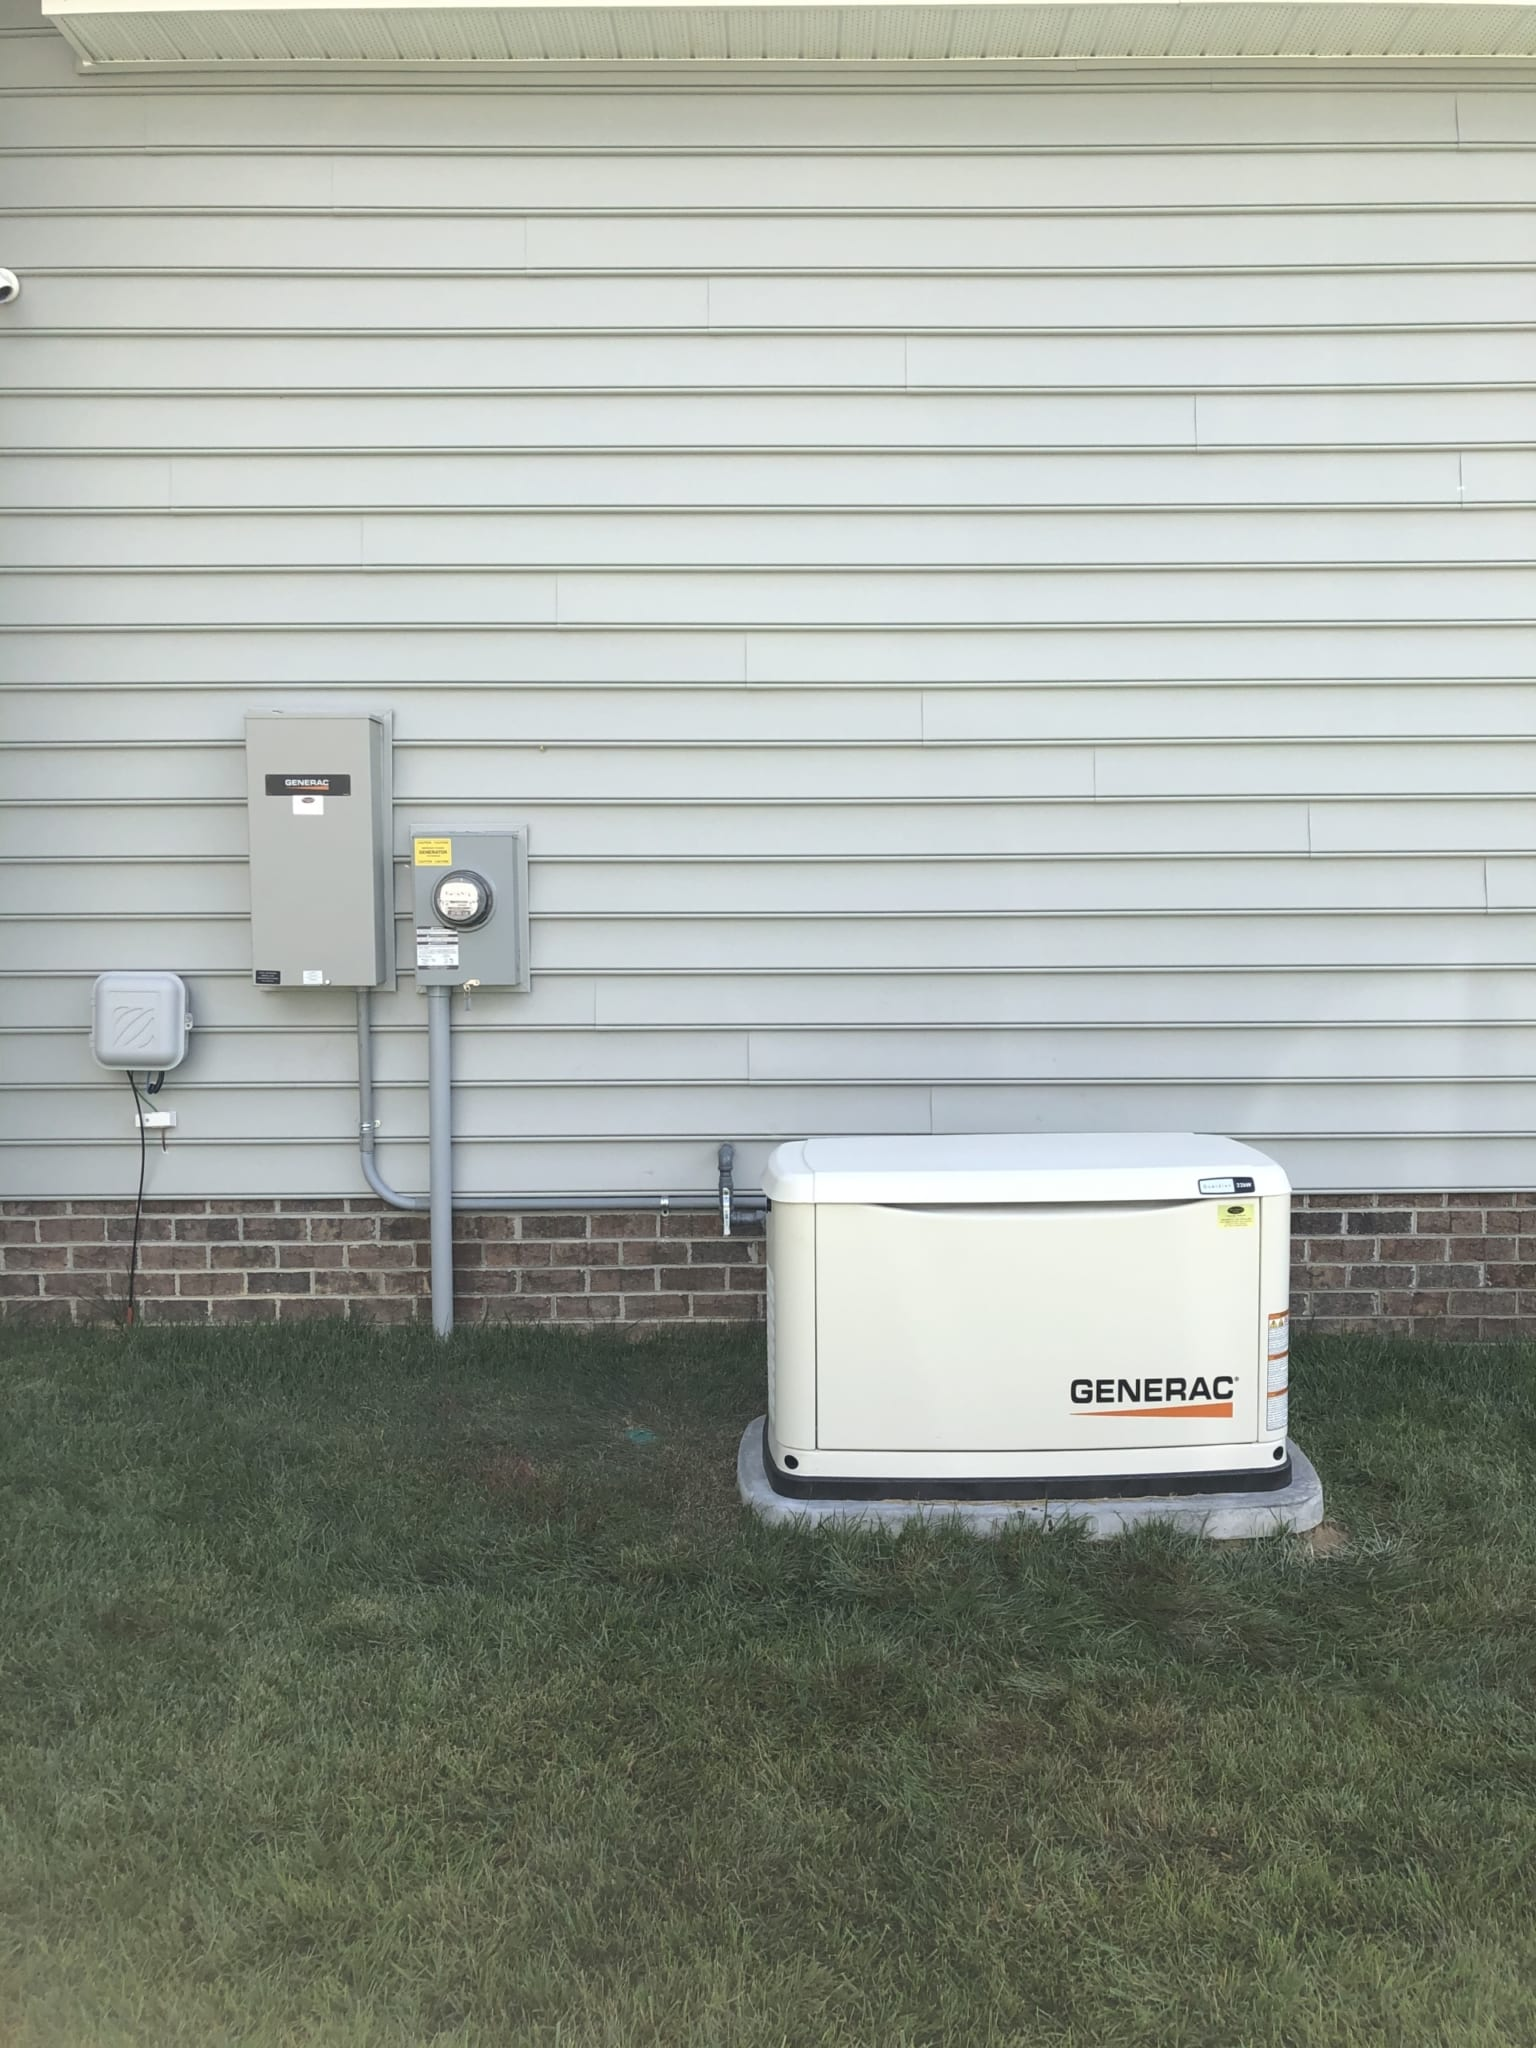 7.8.20 Generac Automatic Standby Generator System